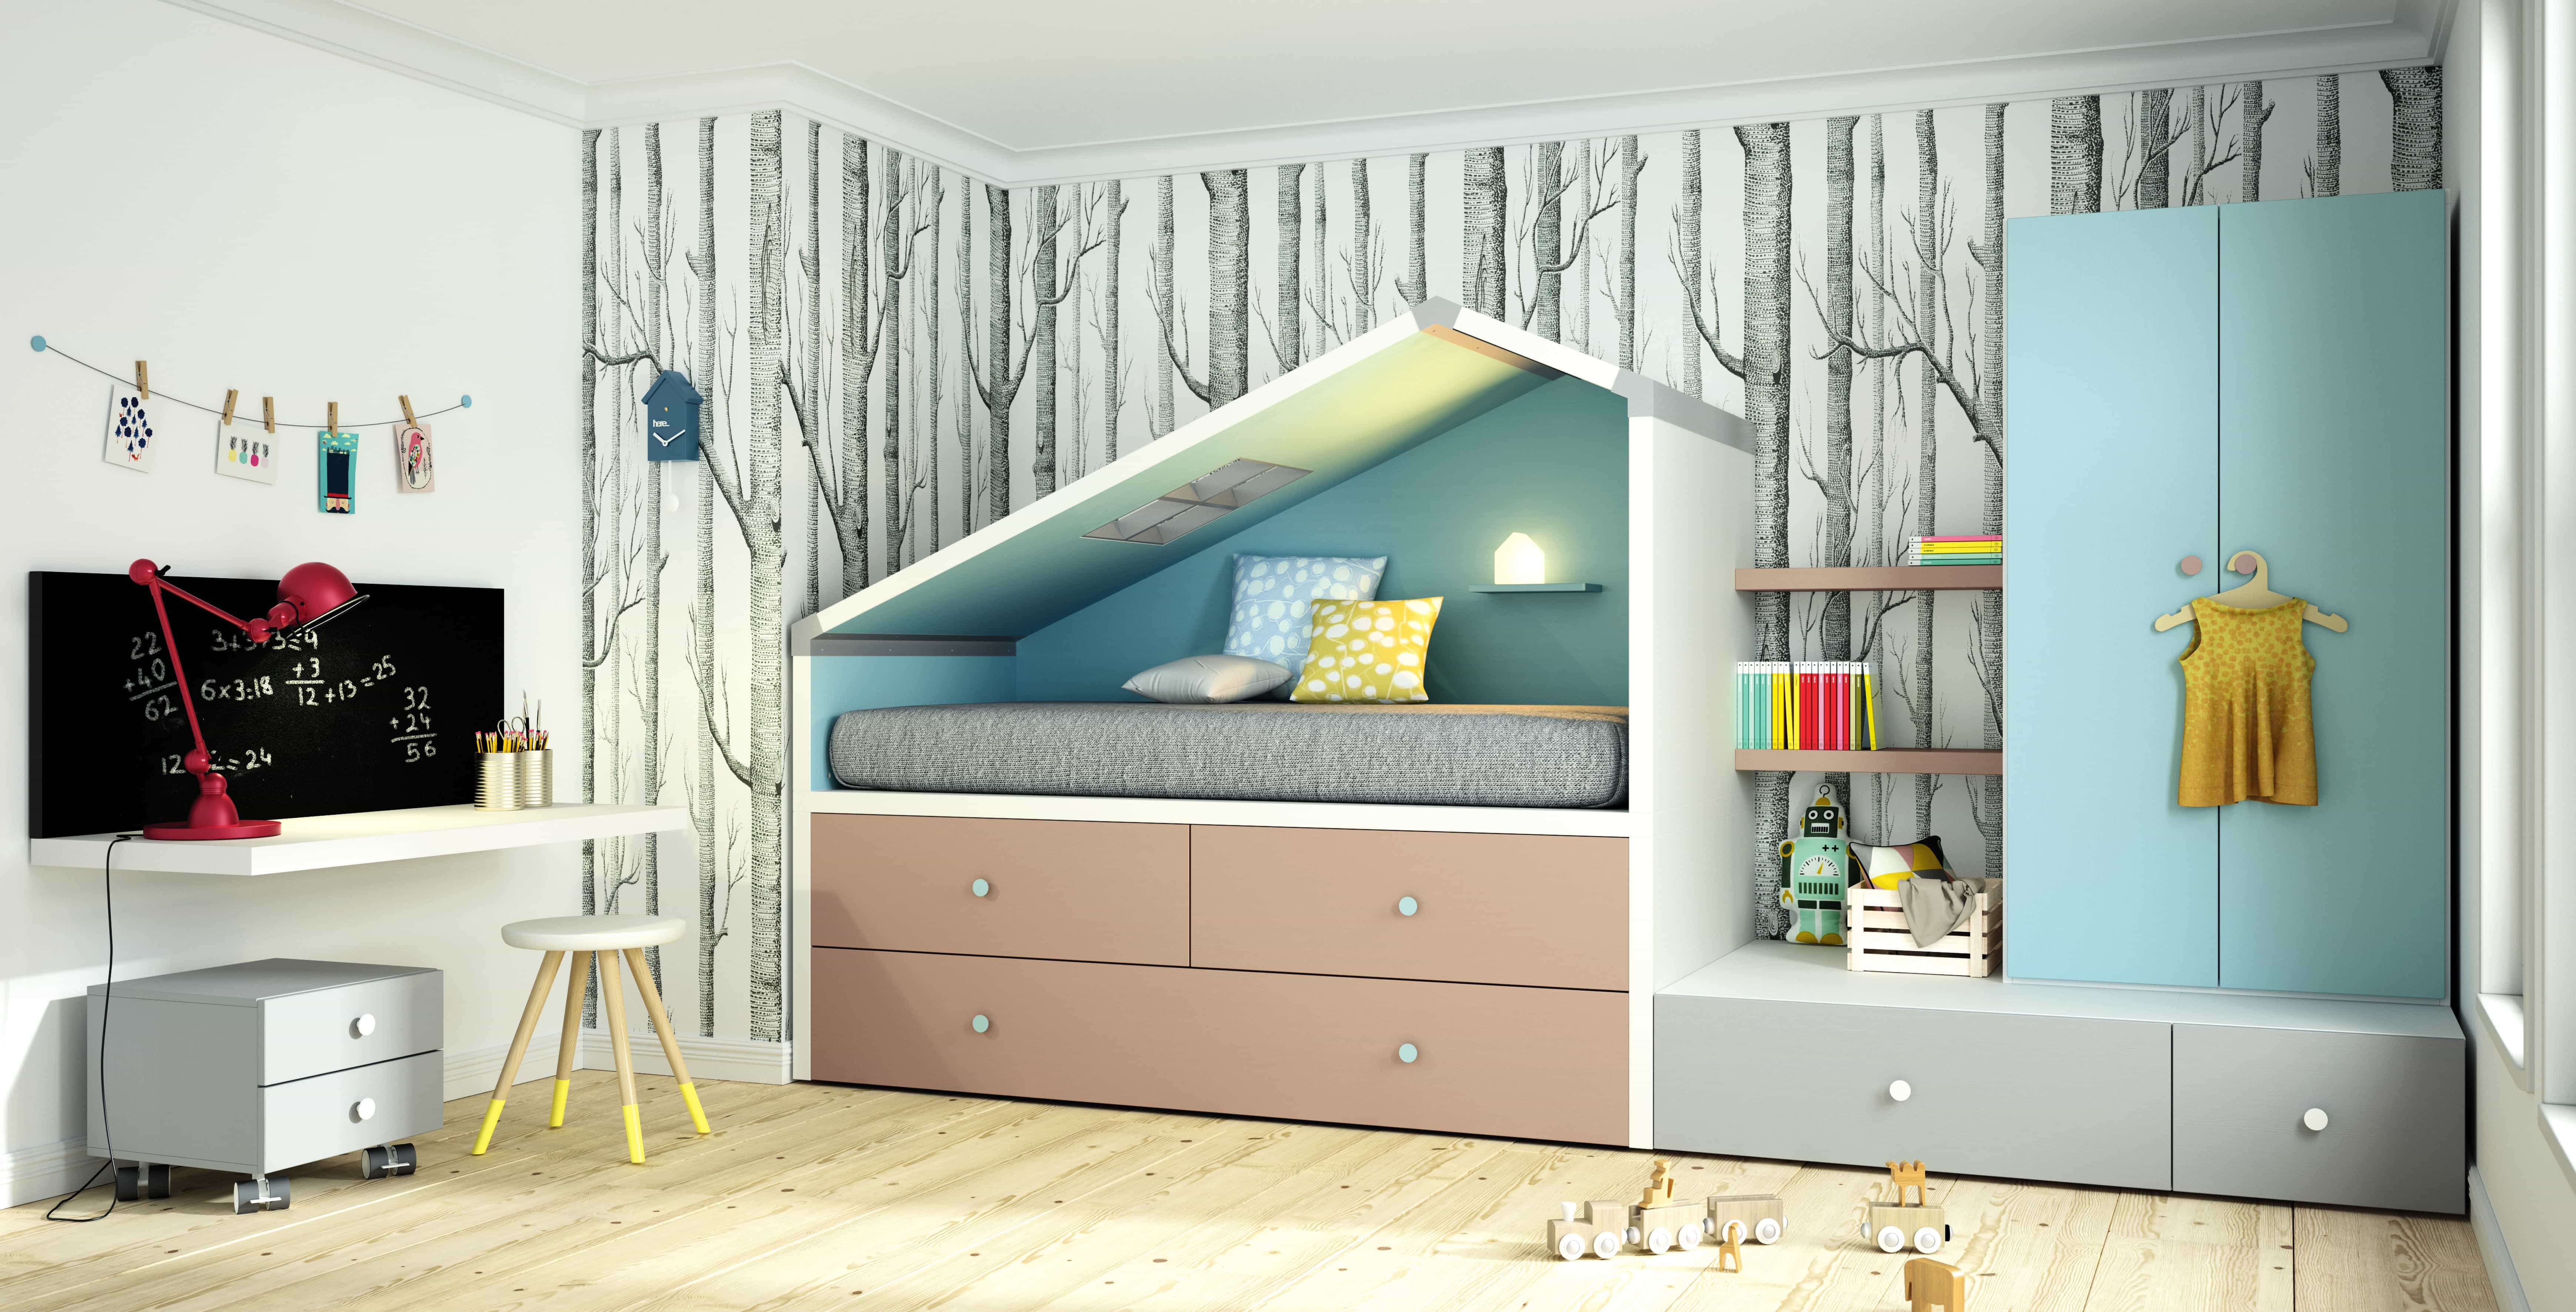 Camas nidos para dormitorios infantiles y juveniles - Cama tren ikea ...